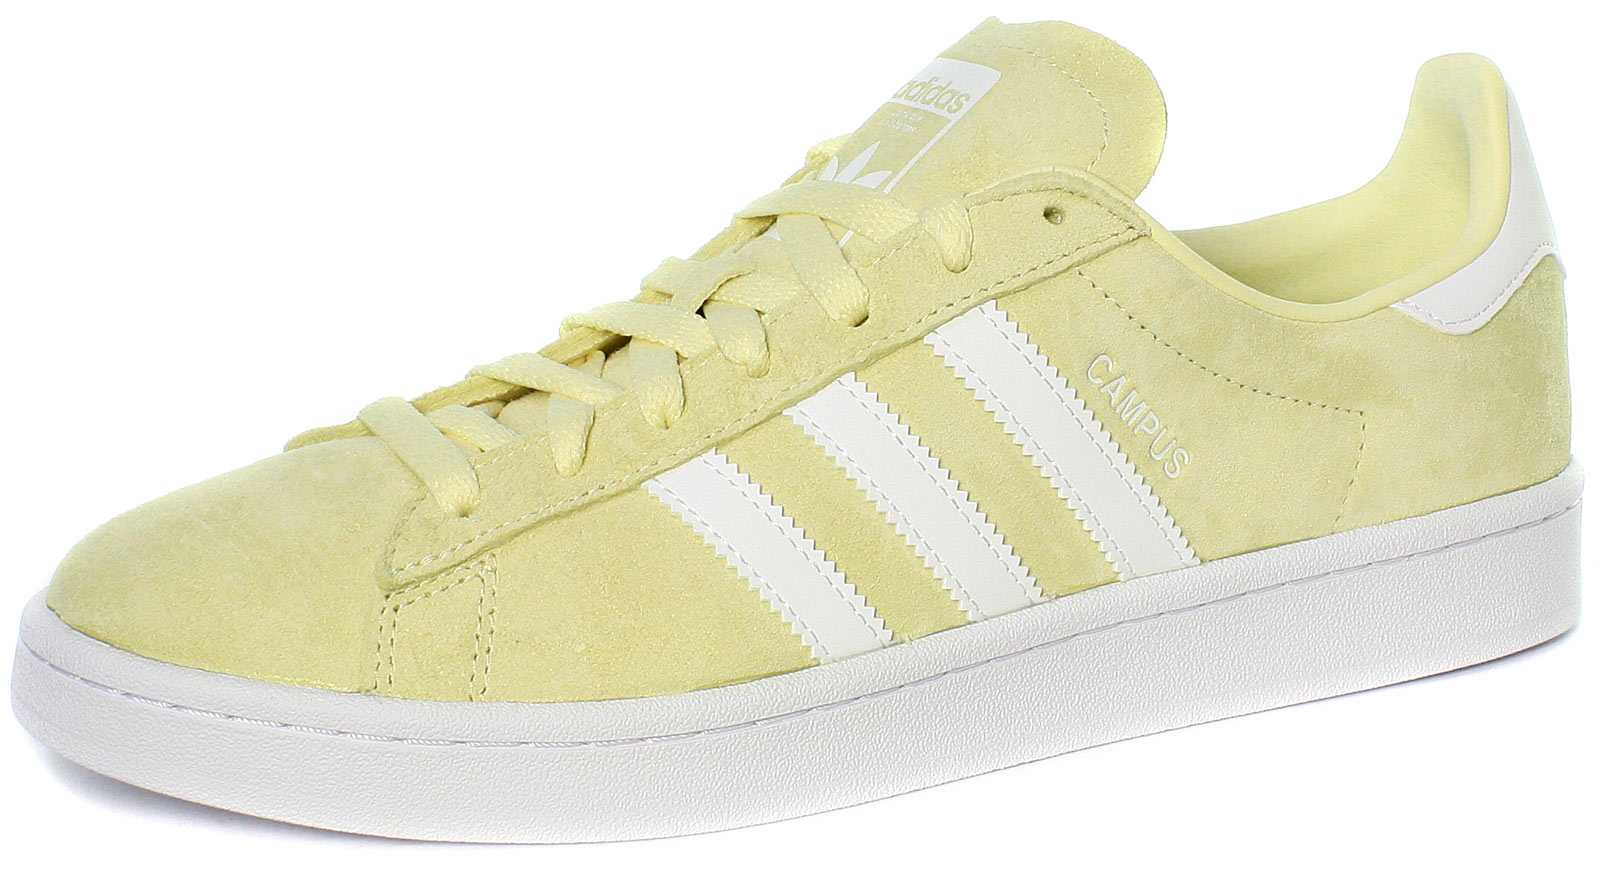 adidas originals campus trainers in beige bz0072